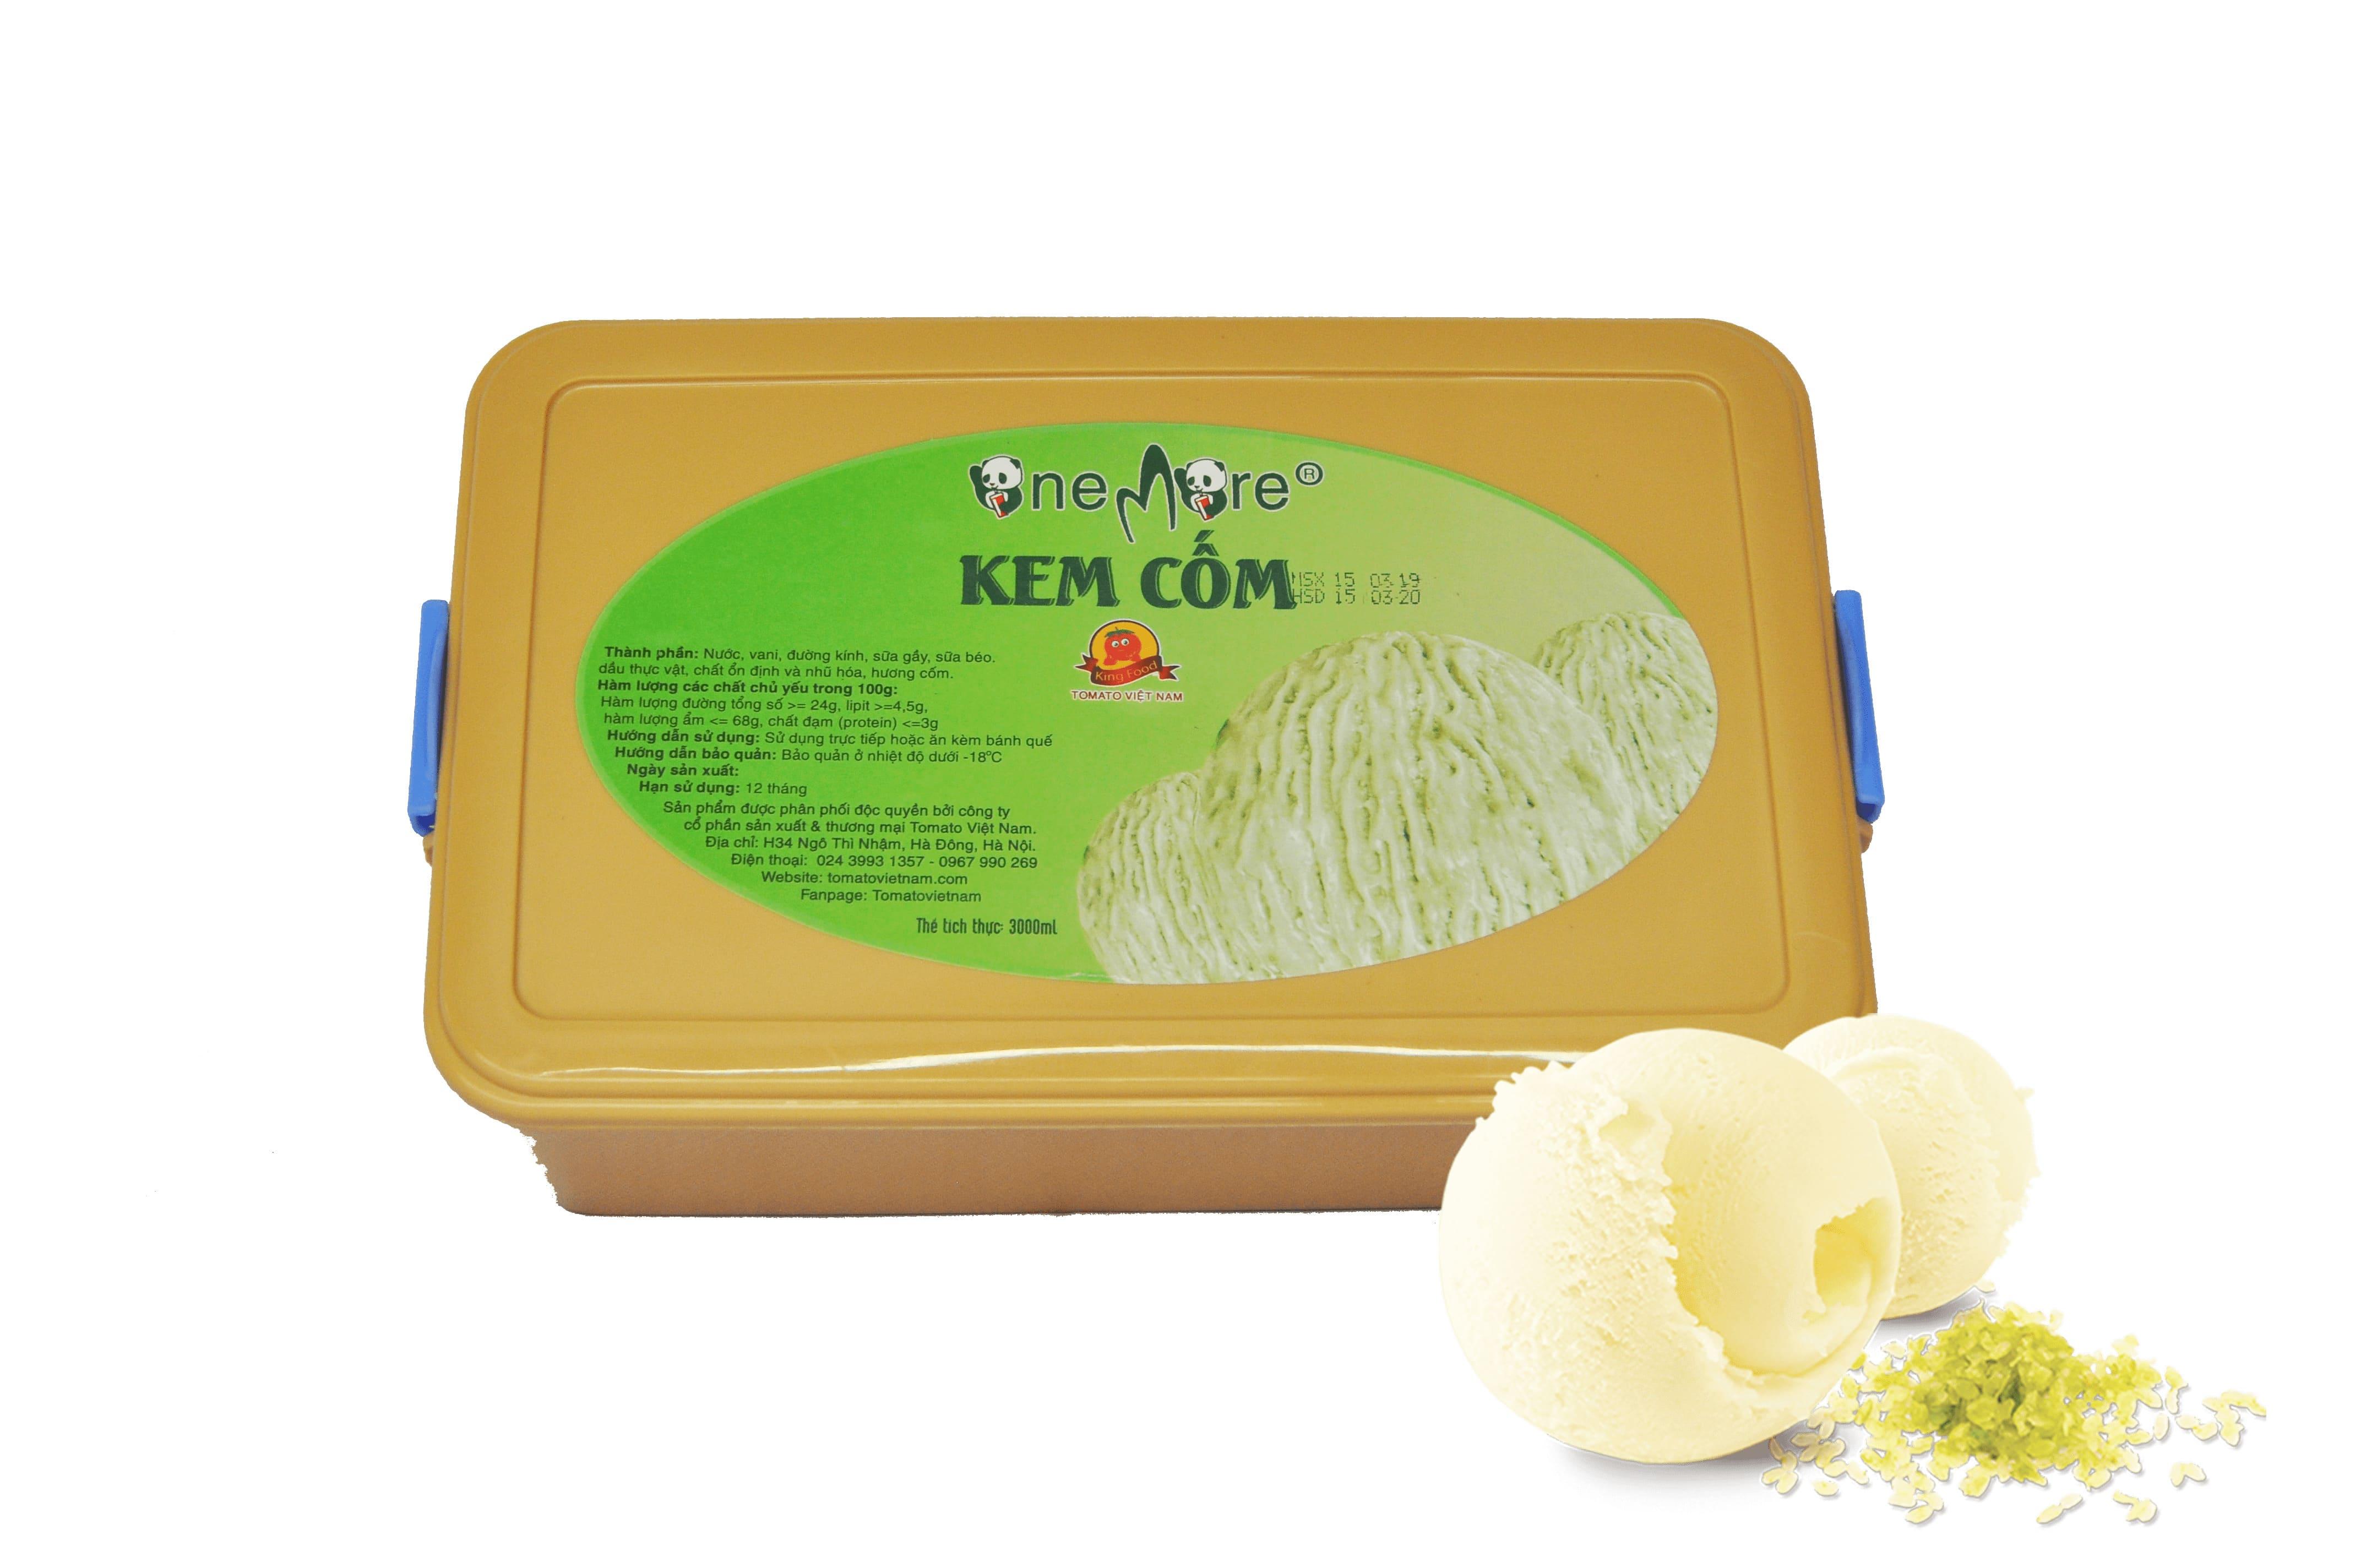 kem-ly-onemore-vi-com